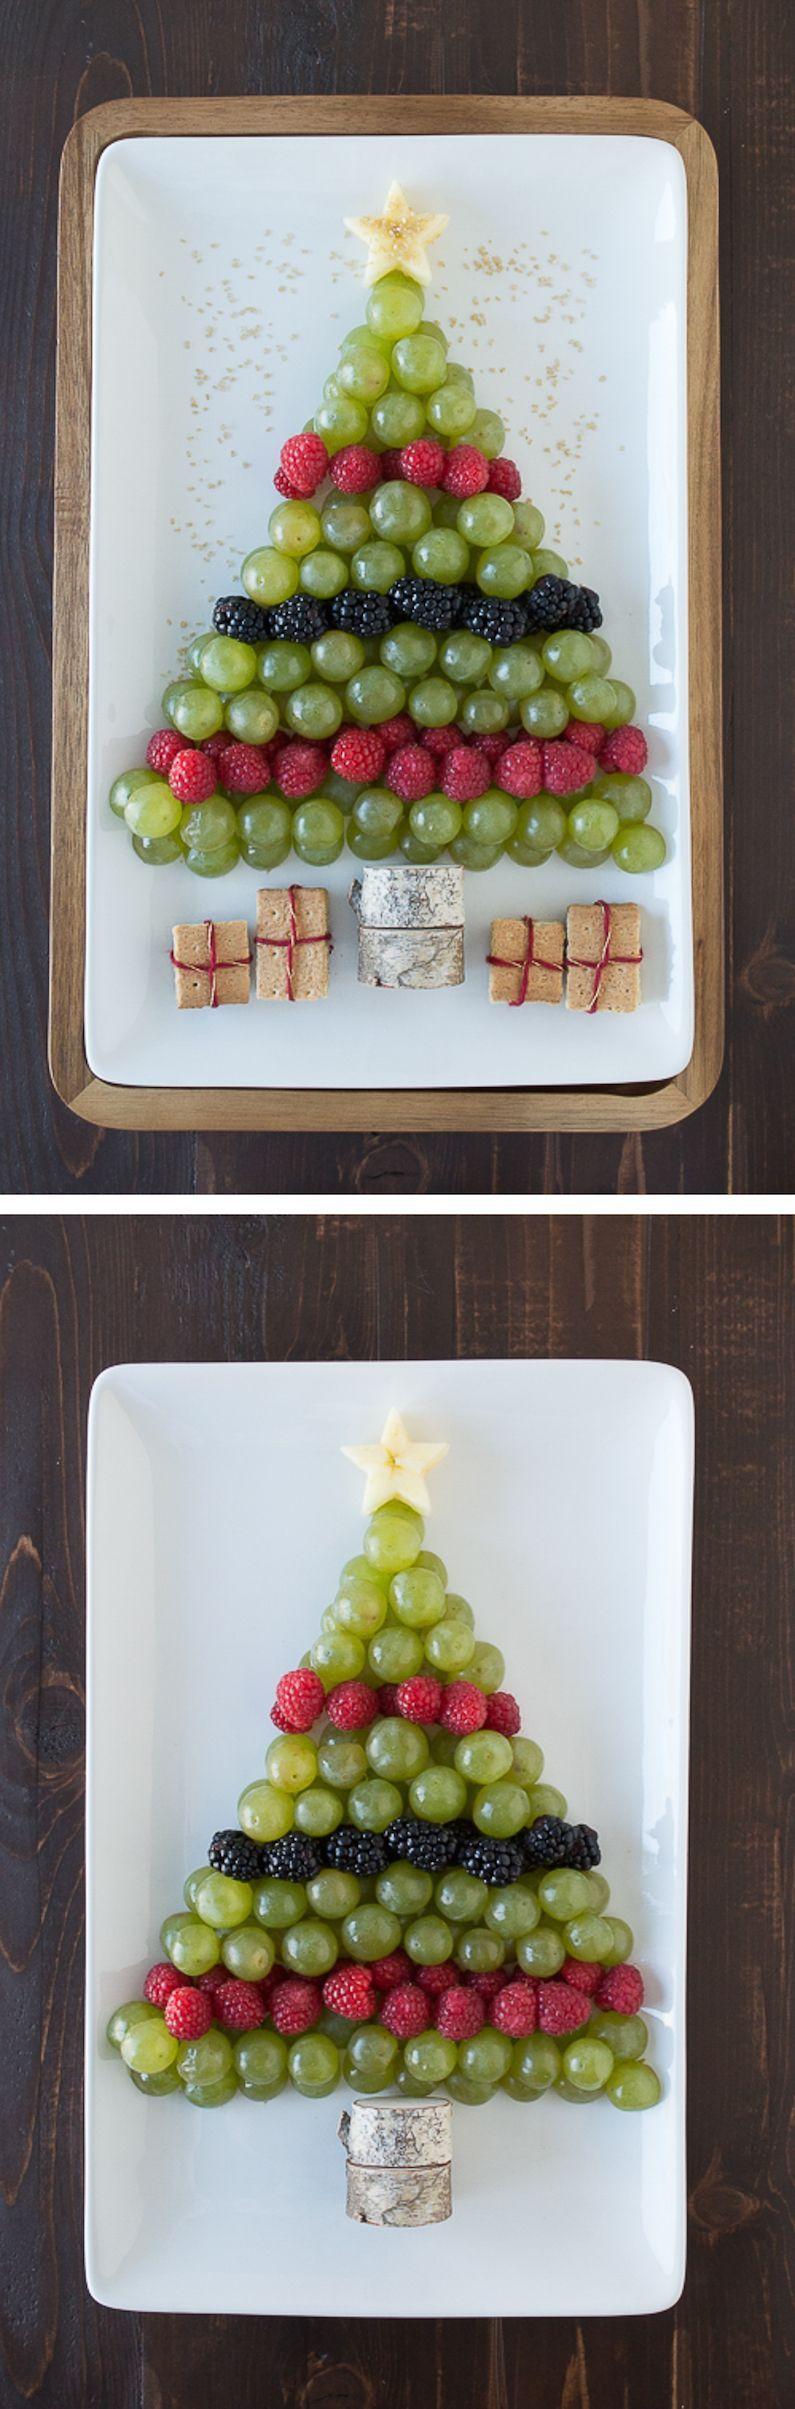 Christmas Tree Fruit Platter.Create A Healthy Fruit Platter For Christmas In The Shape Of